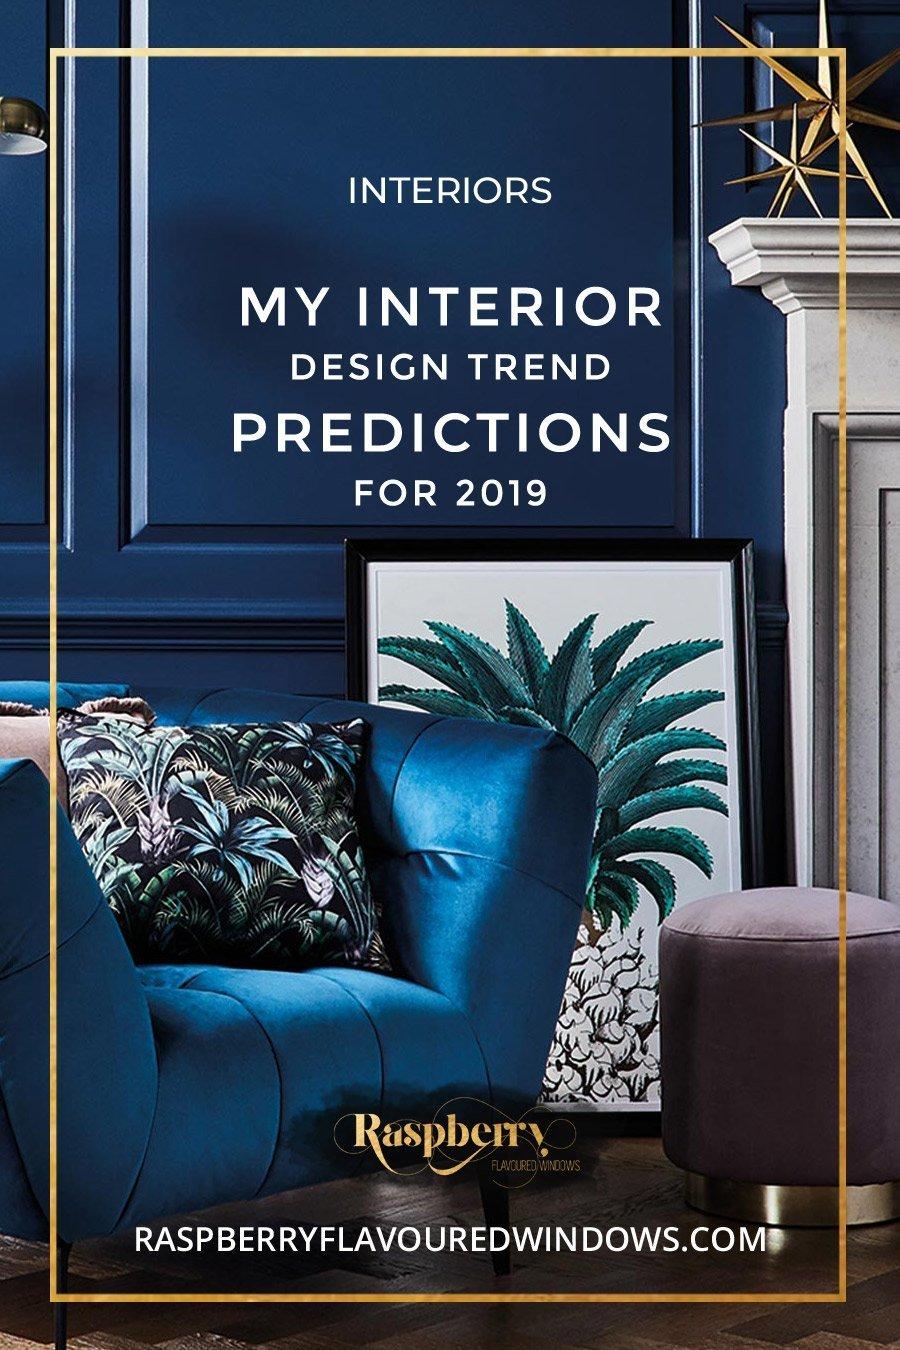 My Interior Design Predictions for 2019